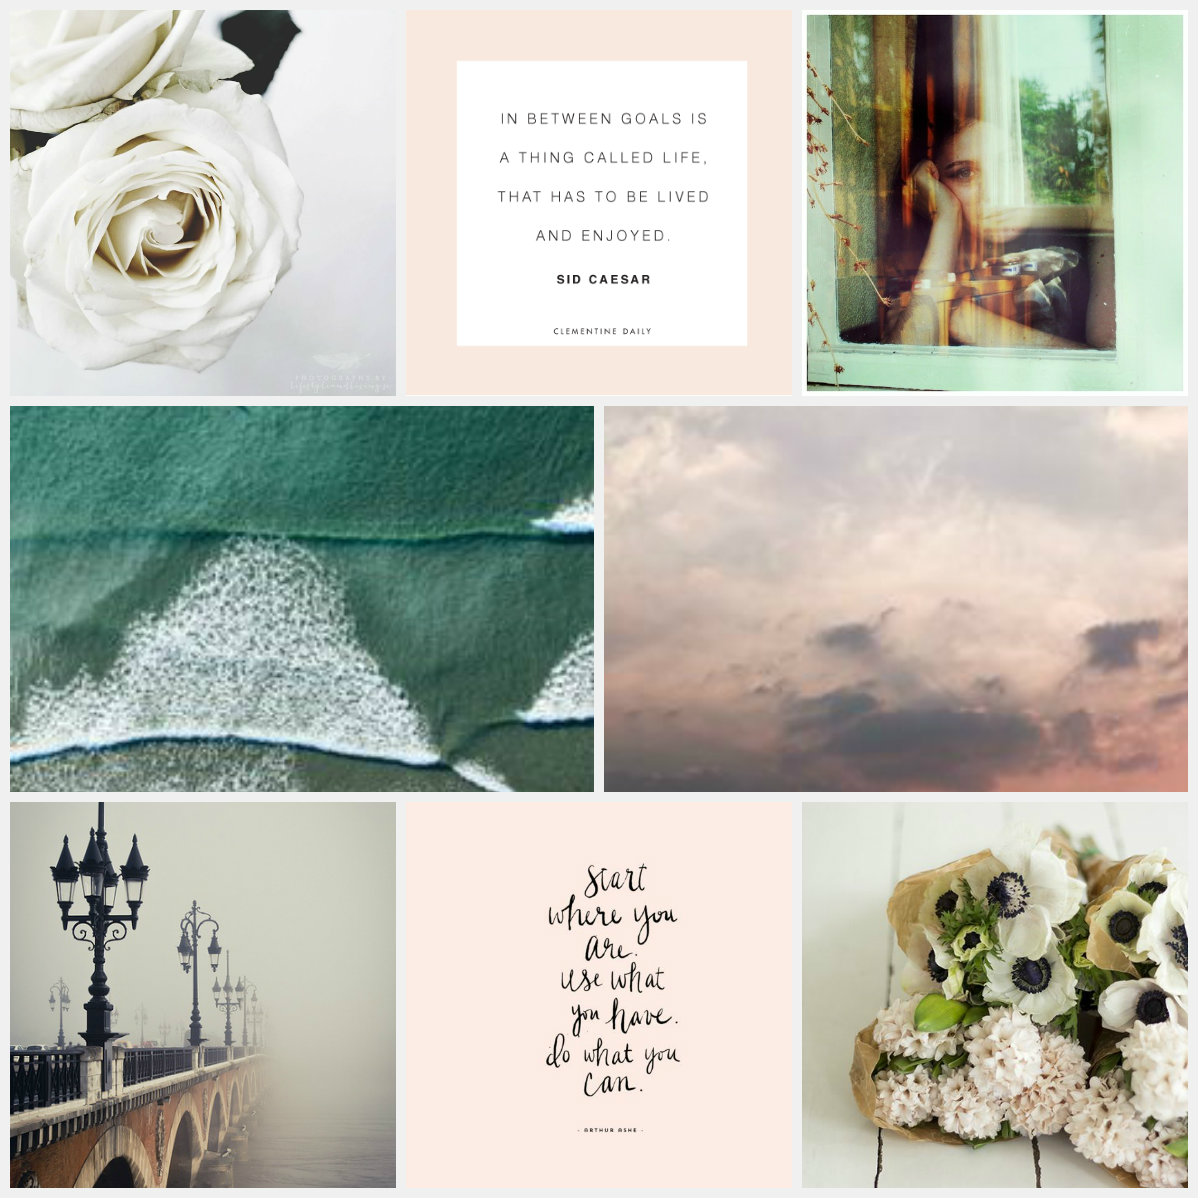 Pinterest, Moodboard, blush pink, green, ocean, waves, sunset, florals, flowers, floral, bloom, lamps, bridge, mist